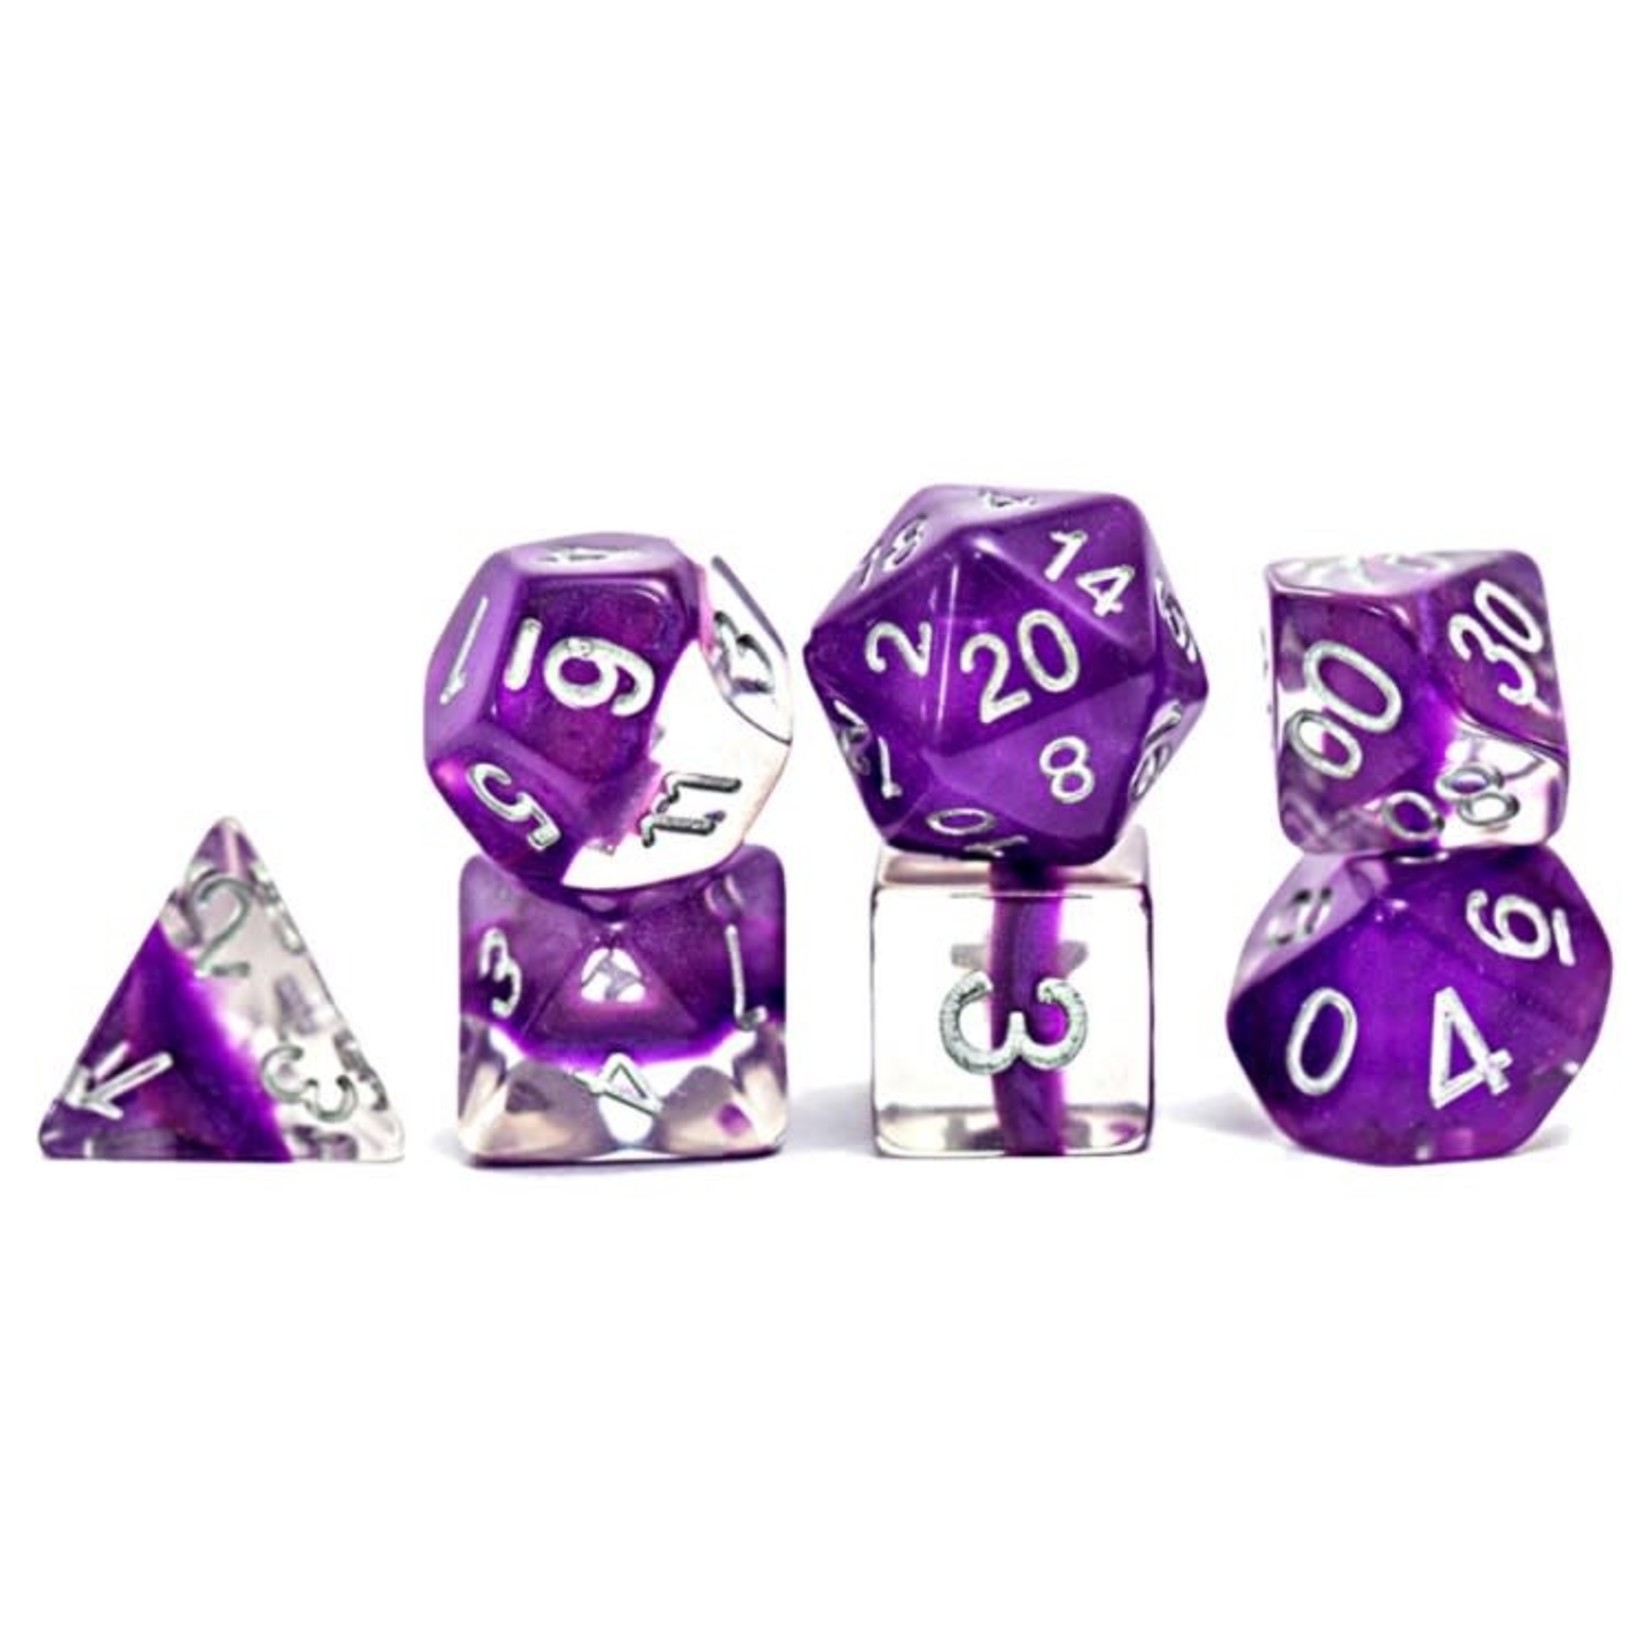 GateKeeper Gate Keepers Dice: Polyhedral Dice Set - Neutron: Violet